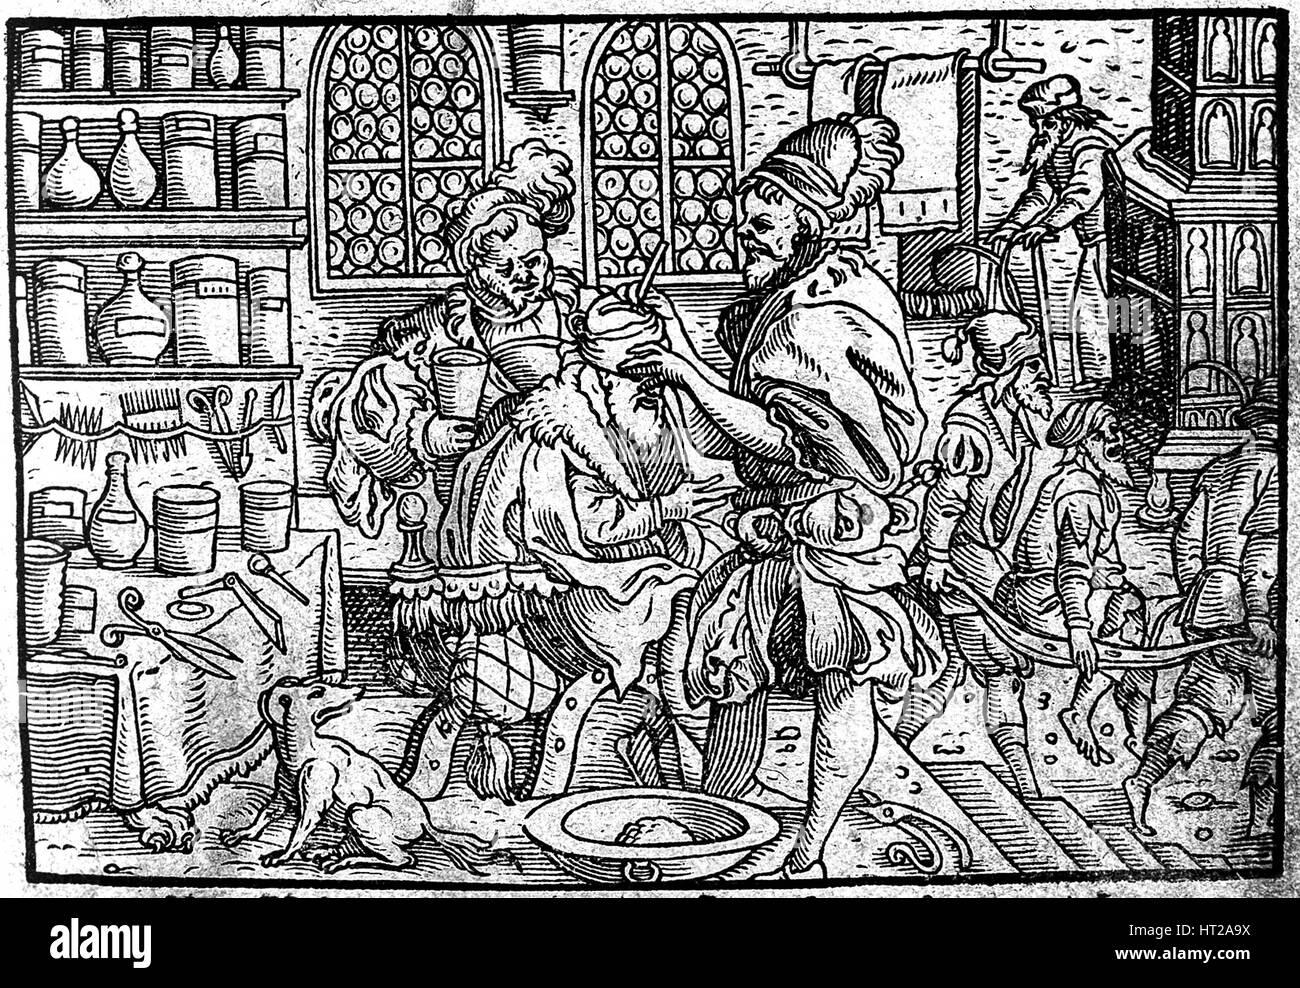 Operation on a man's head. From: Die große Wundarzney by Theophrastus Bombastus von Hohenheim, 1562. Artist: - Stock Image